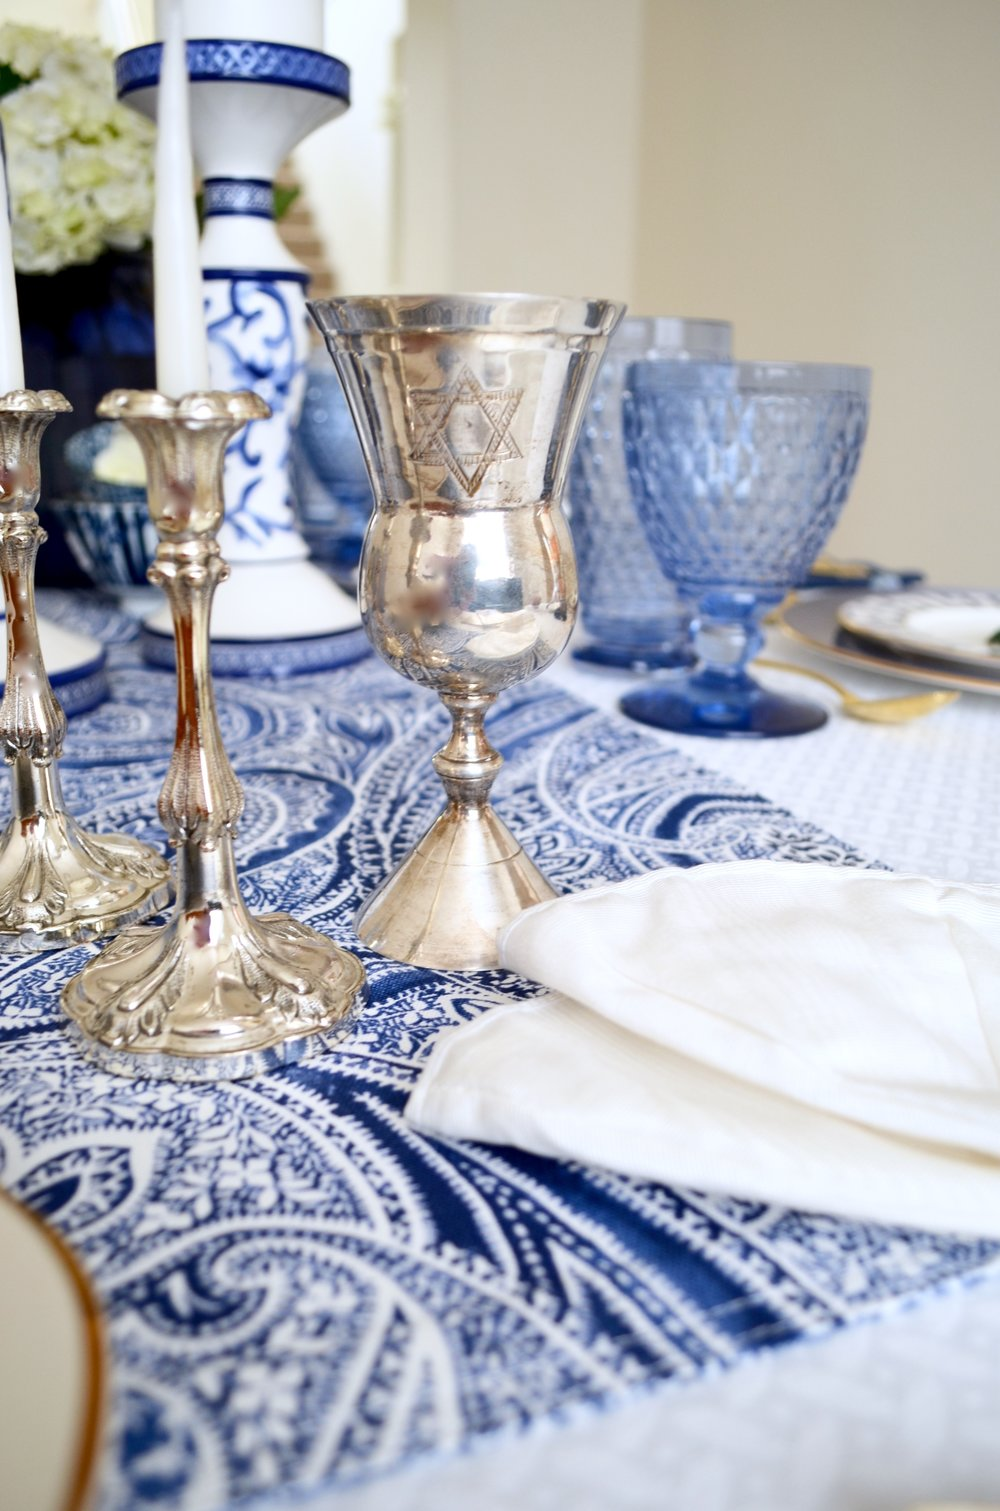 DSC_0912.jpg & SETTING A PASSOVER SEDER TABLE \u2014 Table + Dine by Deborah Shearer